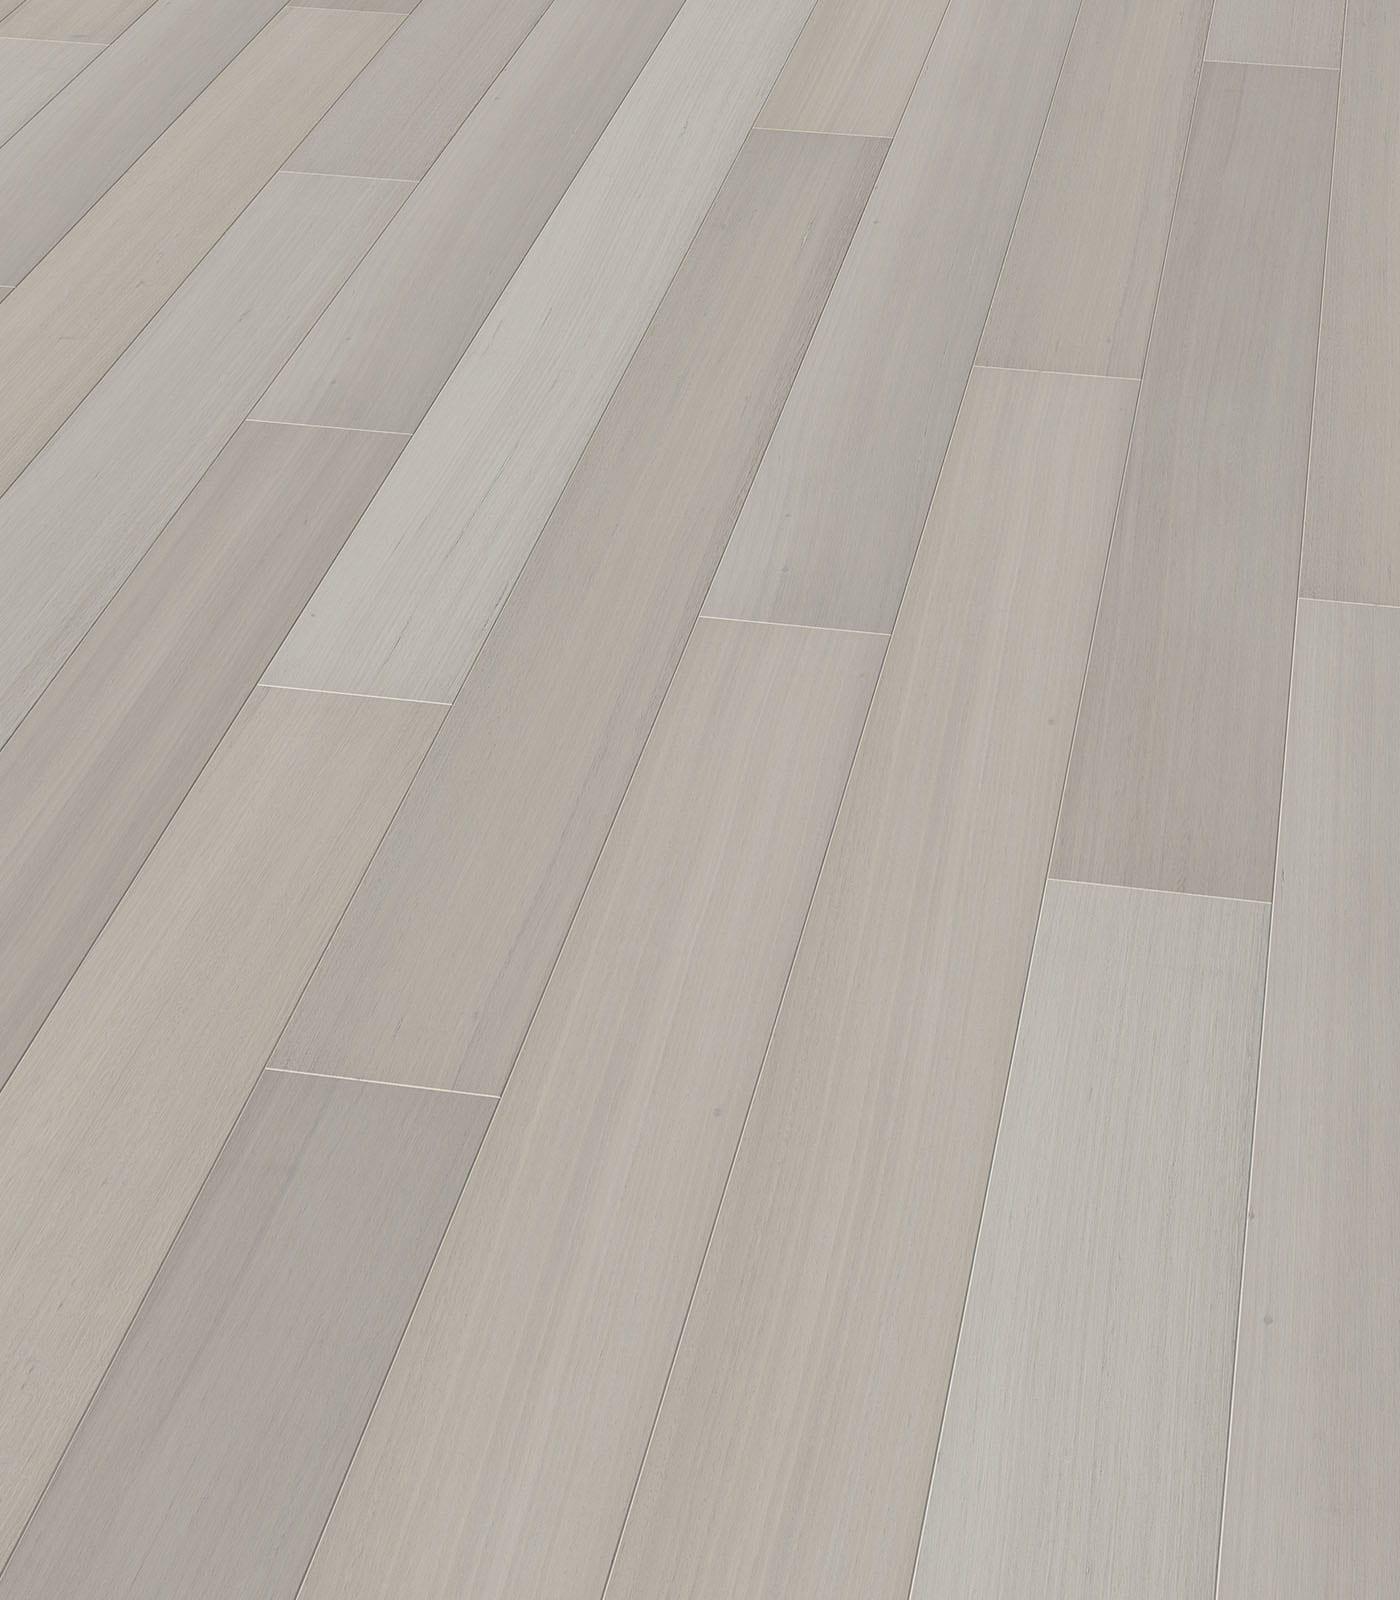 Hobart-After Oak Collection-Tasmanian Oak floors-angle